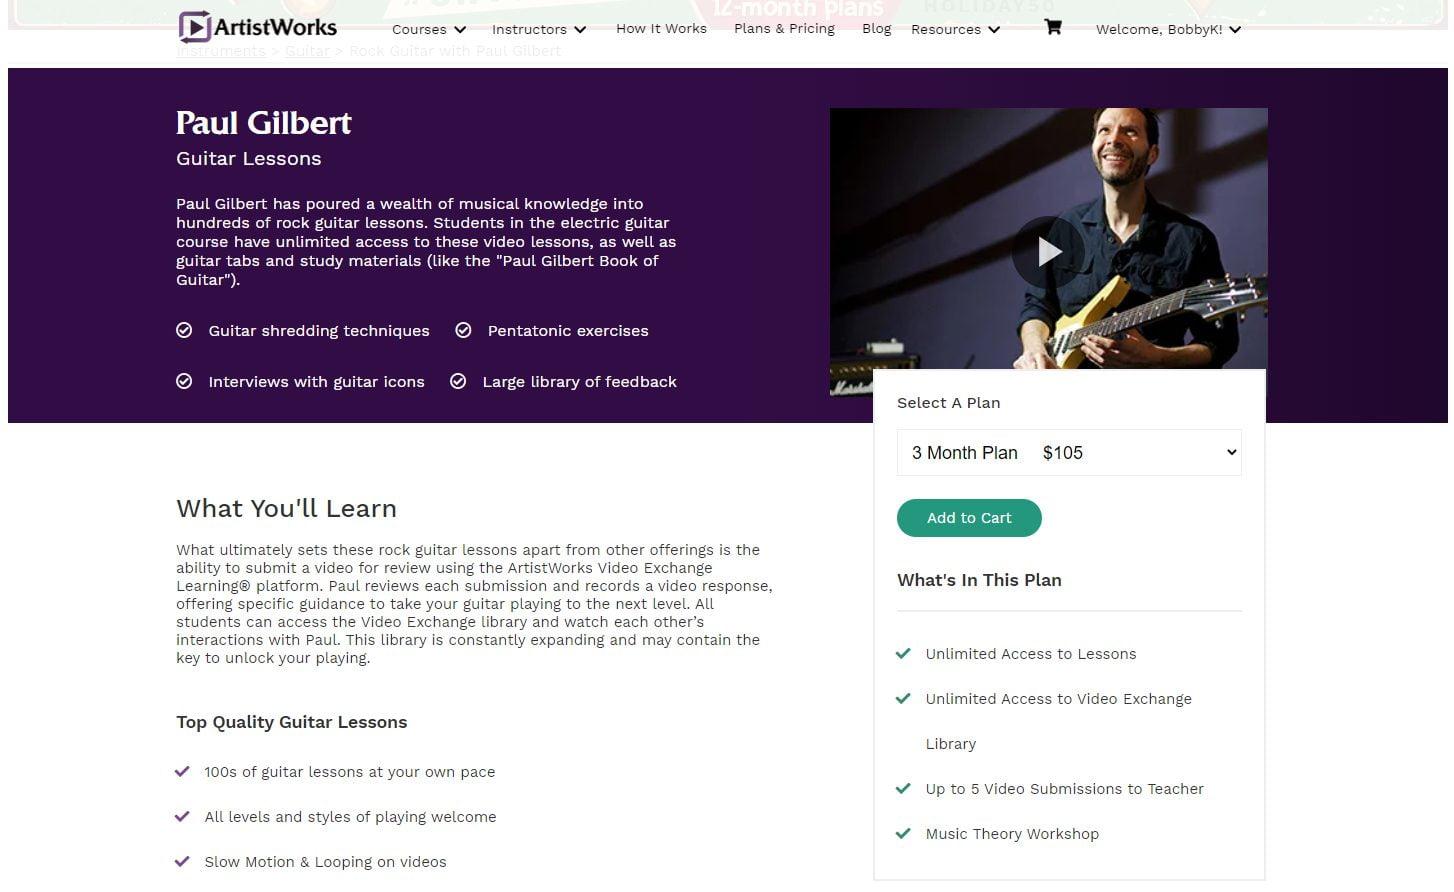 Paul Gilbert Rock Guitar Lessons on ArtistWorks